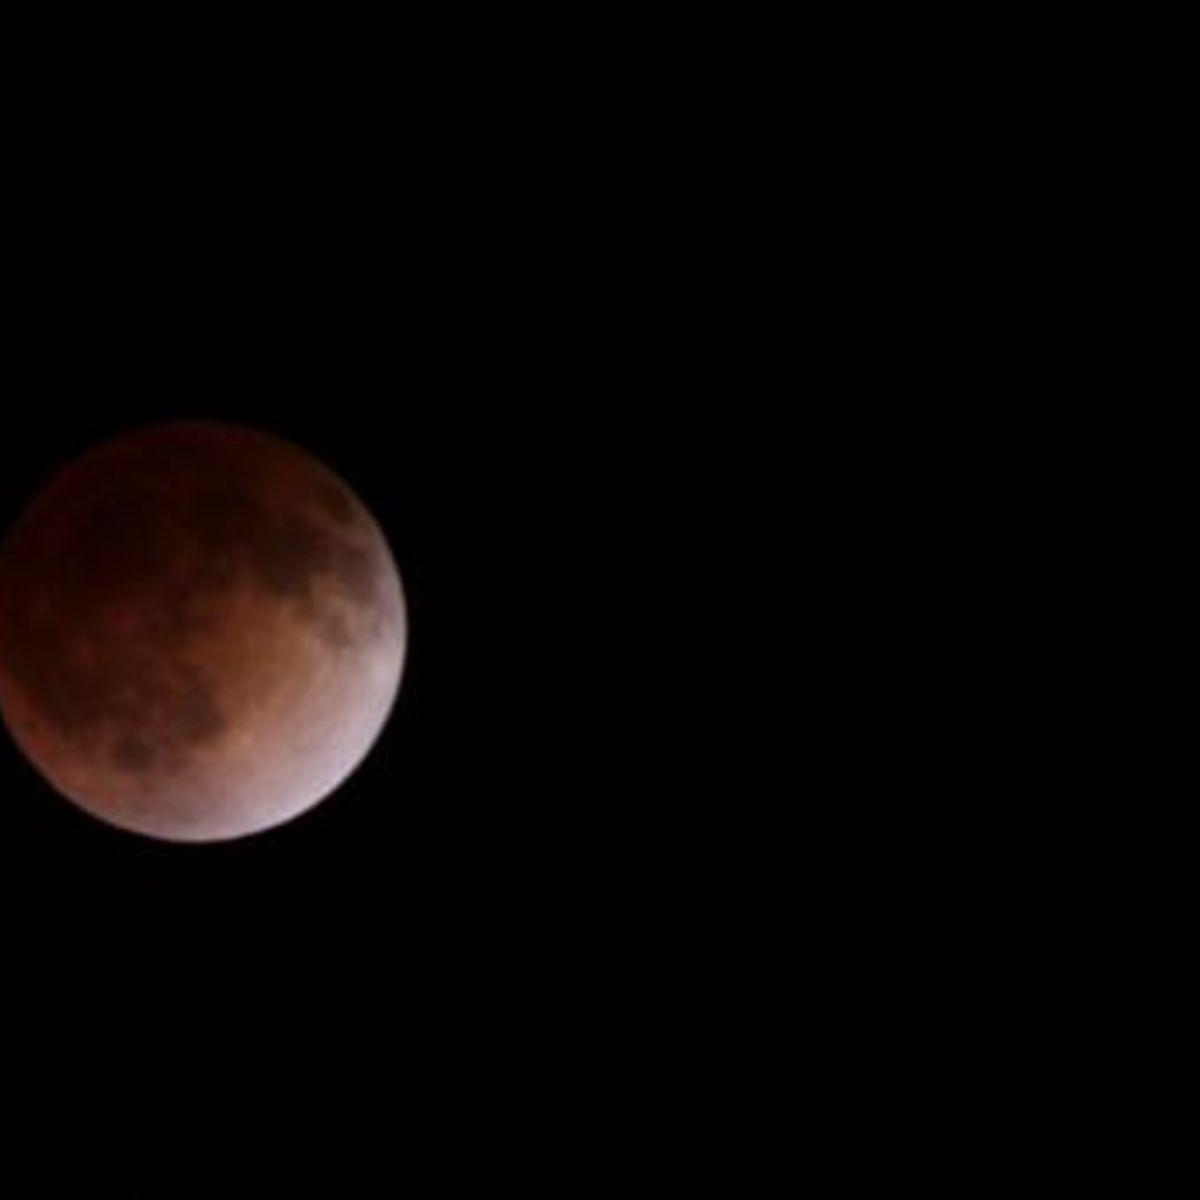 totaleclipse_apr142014.jpg.CROP.rectangle-large_0.jpg